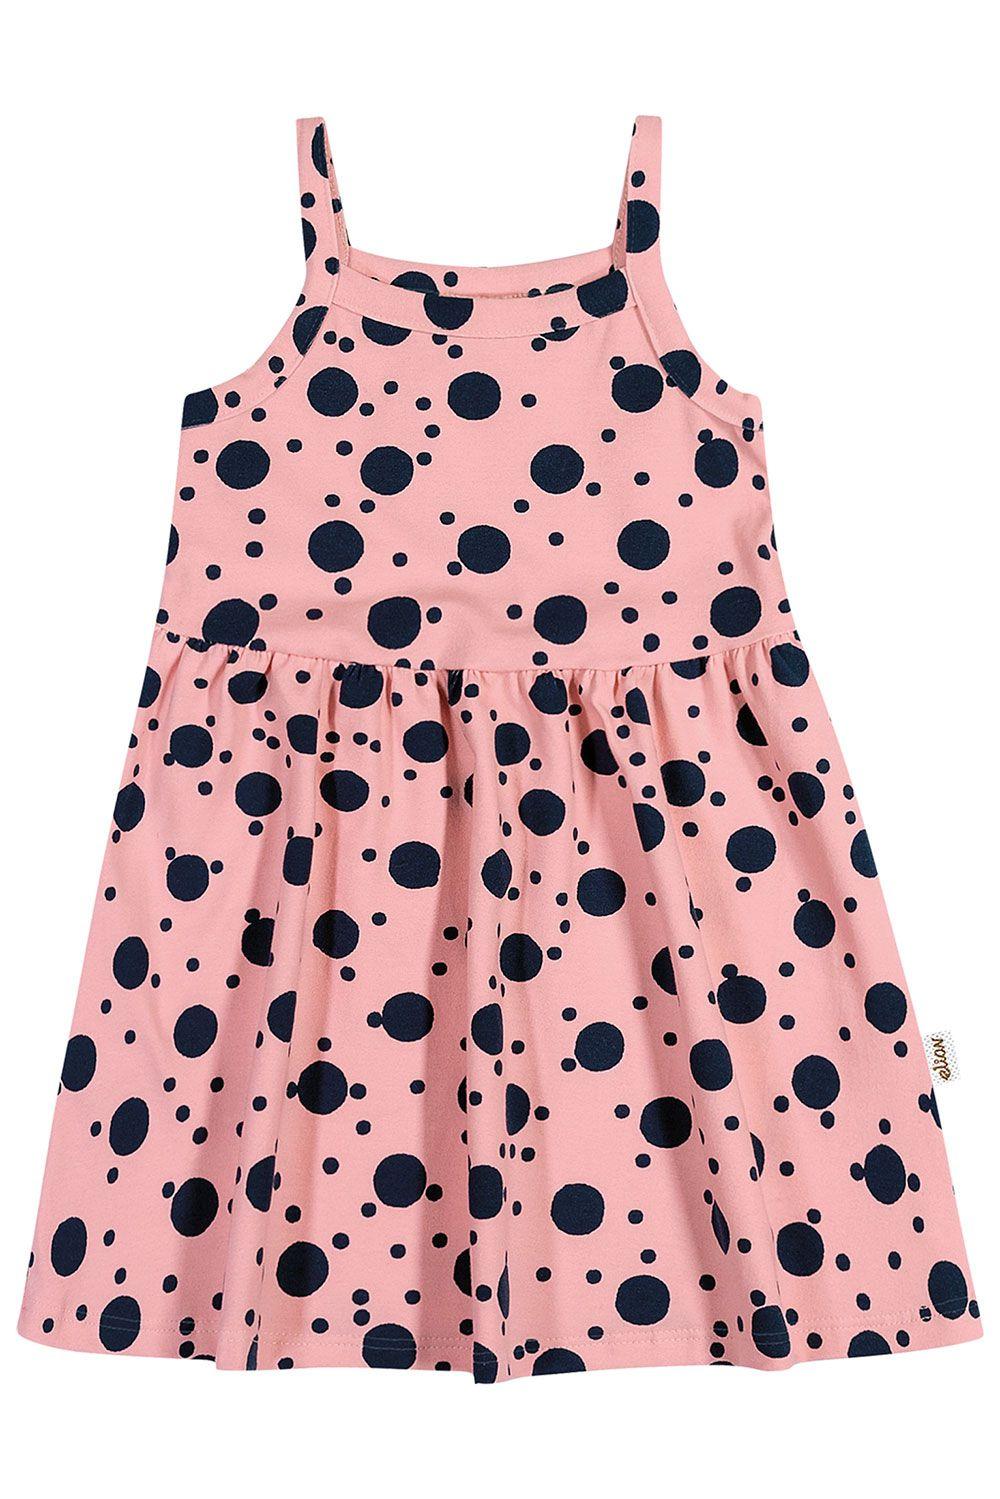 Kit Premium 3 Vestido Infantil Verão Estampas Elian